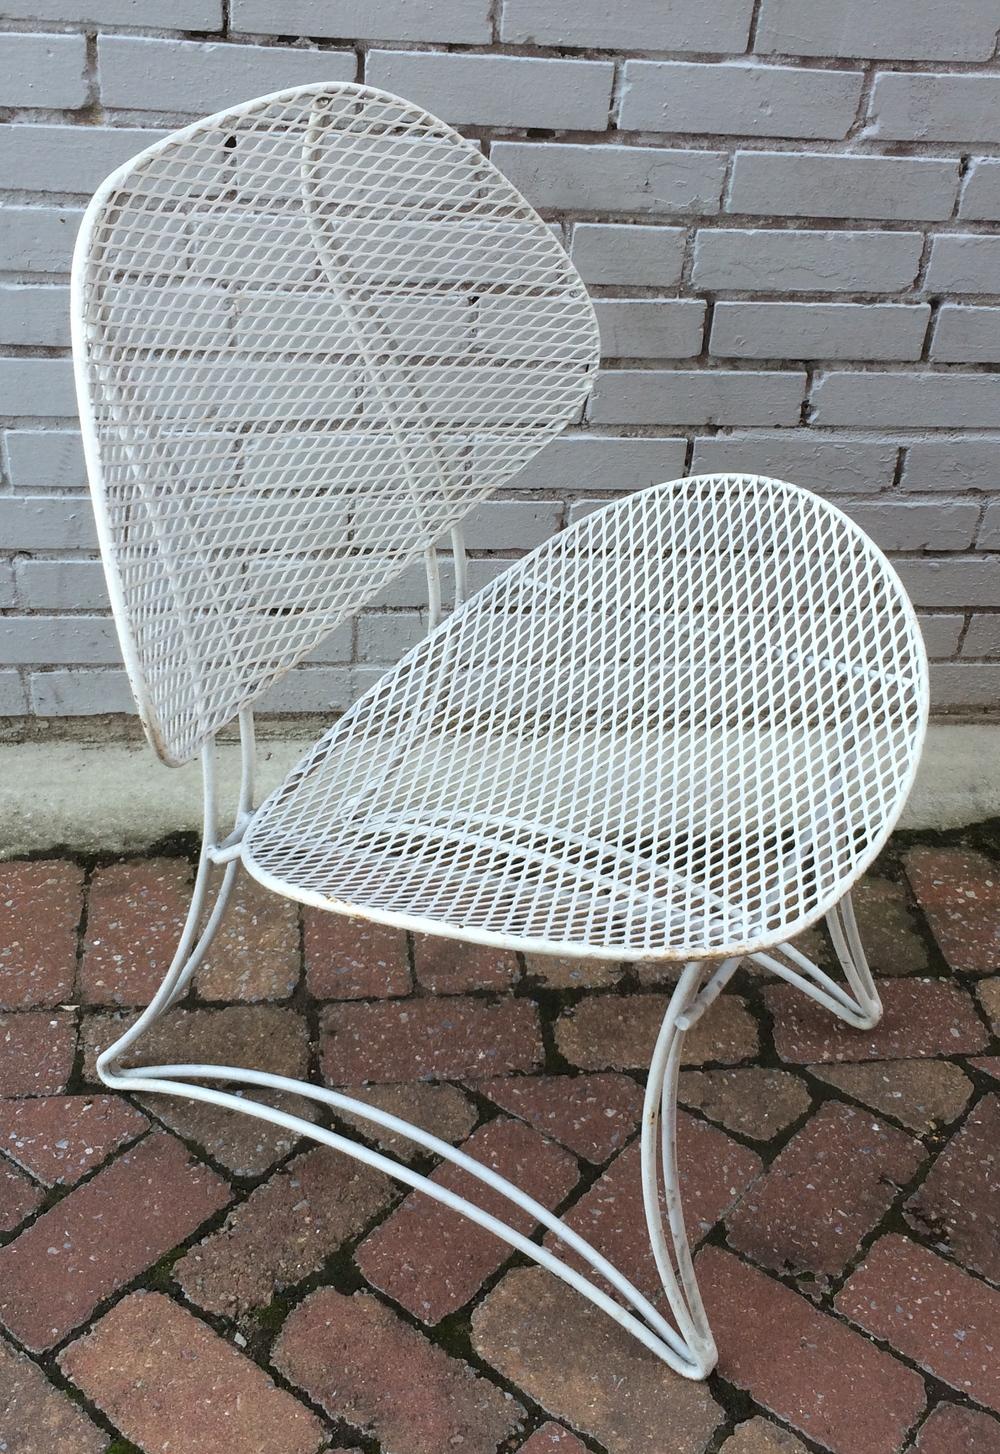 salterini patio chairs dig this rh icandigthis com Vintage Salterini Outdoor Furniture Salterini Patio Set